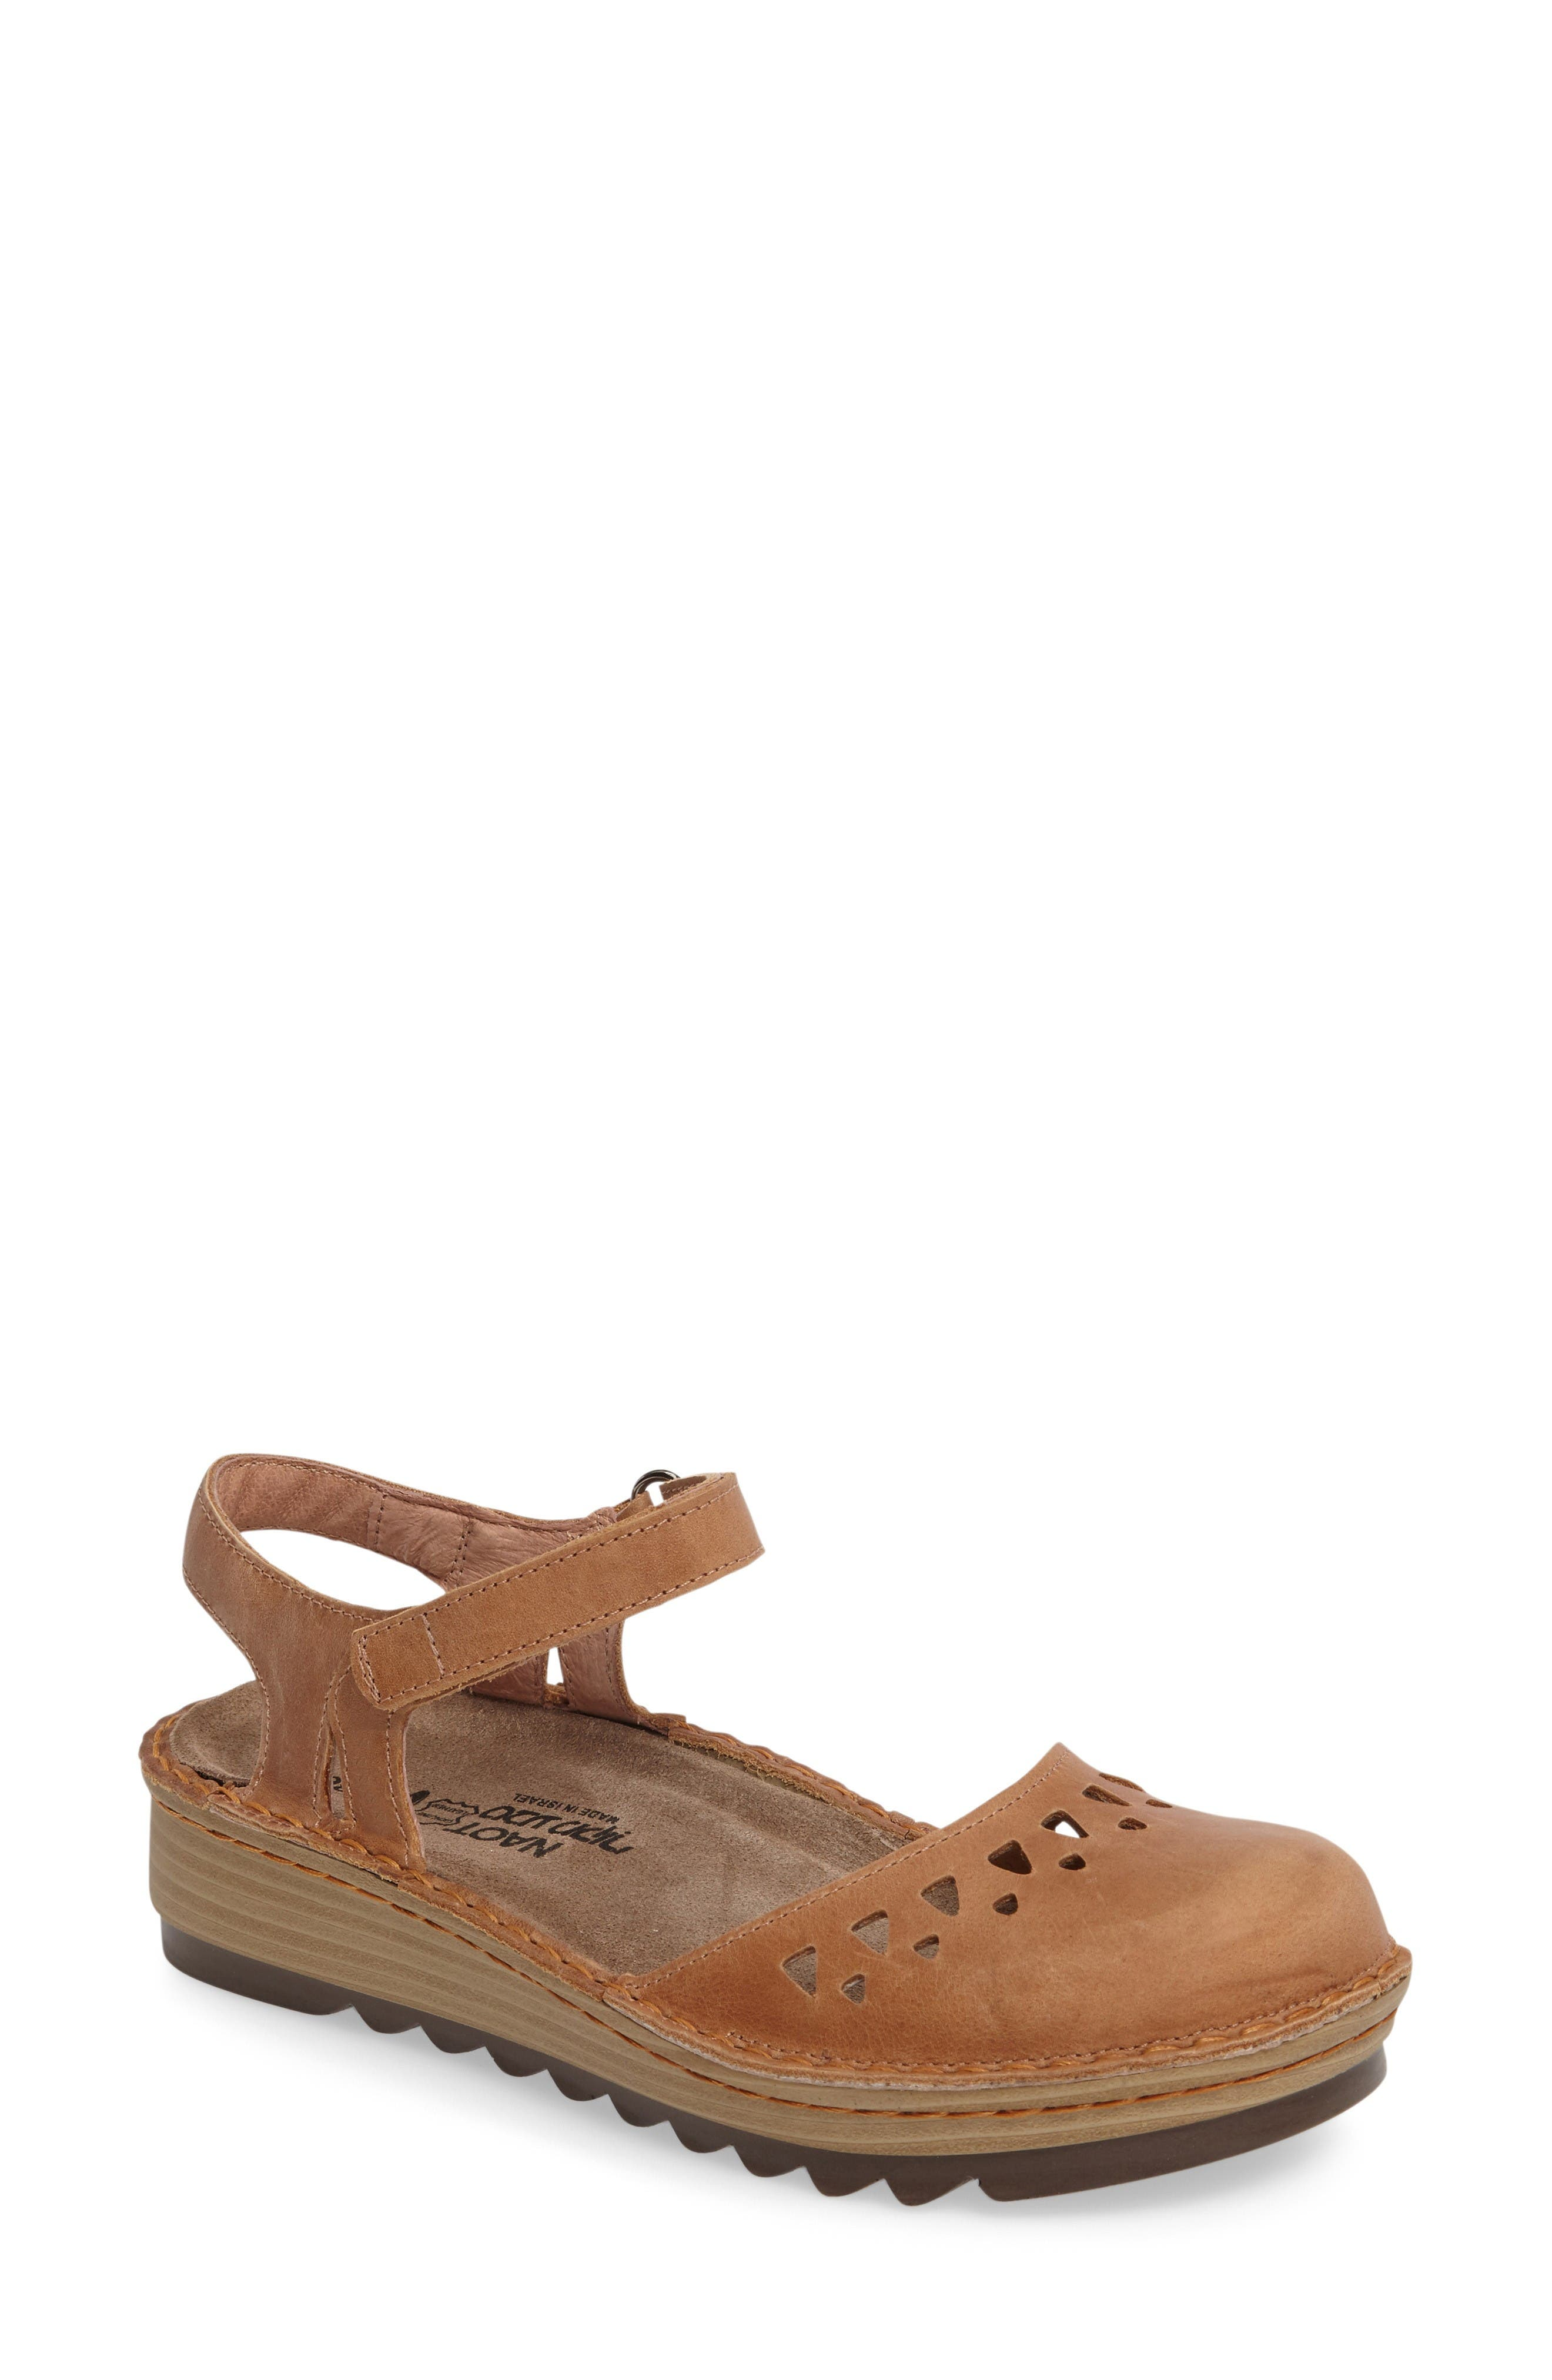 e297e77d6d60 Ankle Strap Heels   High-Heel Shoes for Women